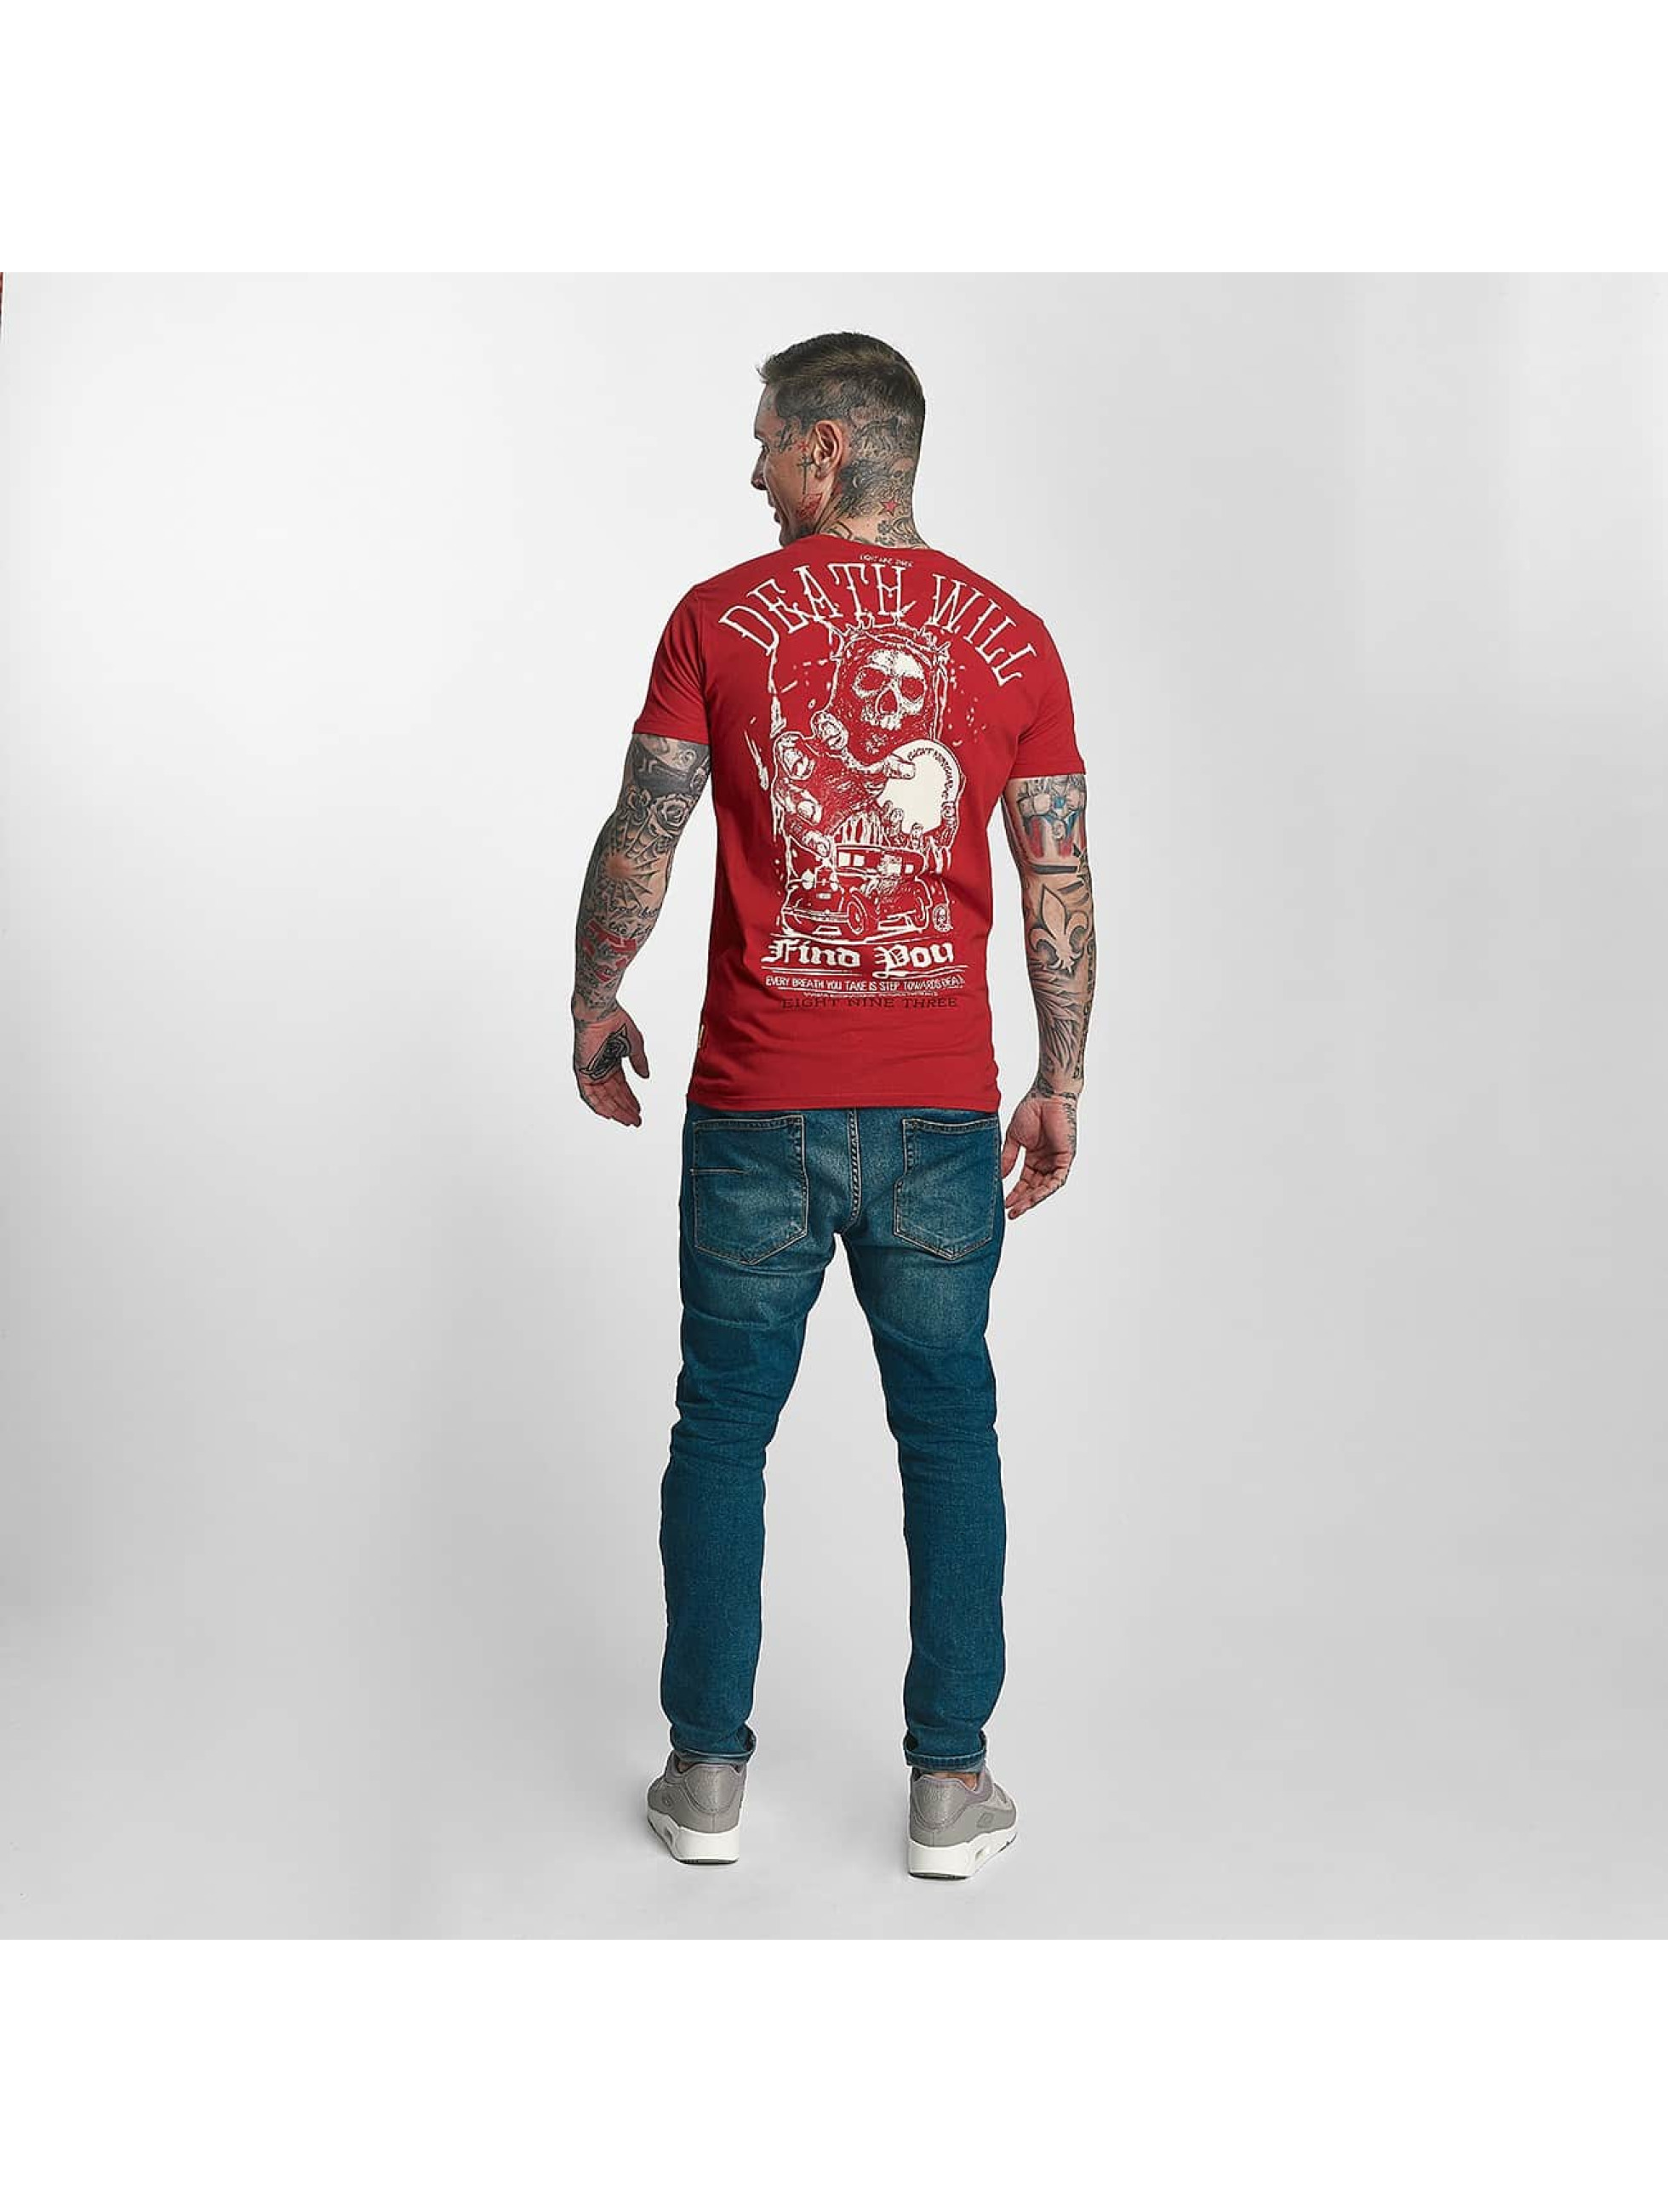 Yakuza T-paidat Death Will Find You punainen